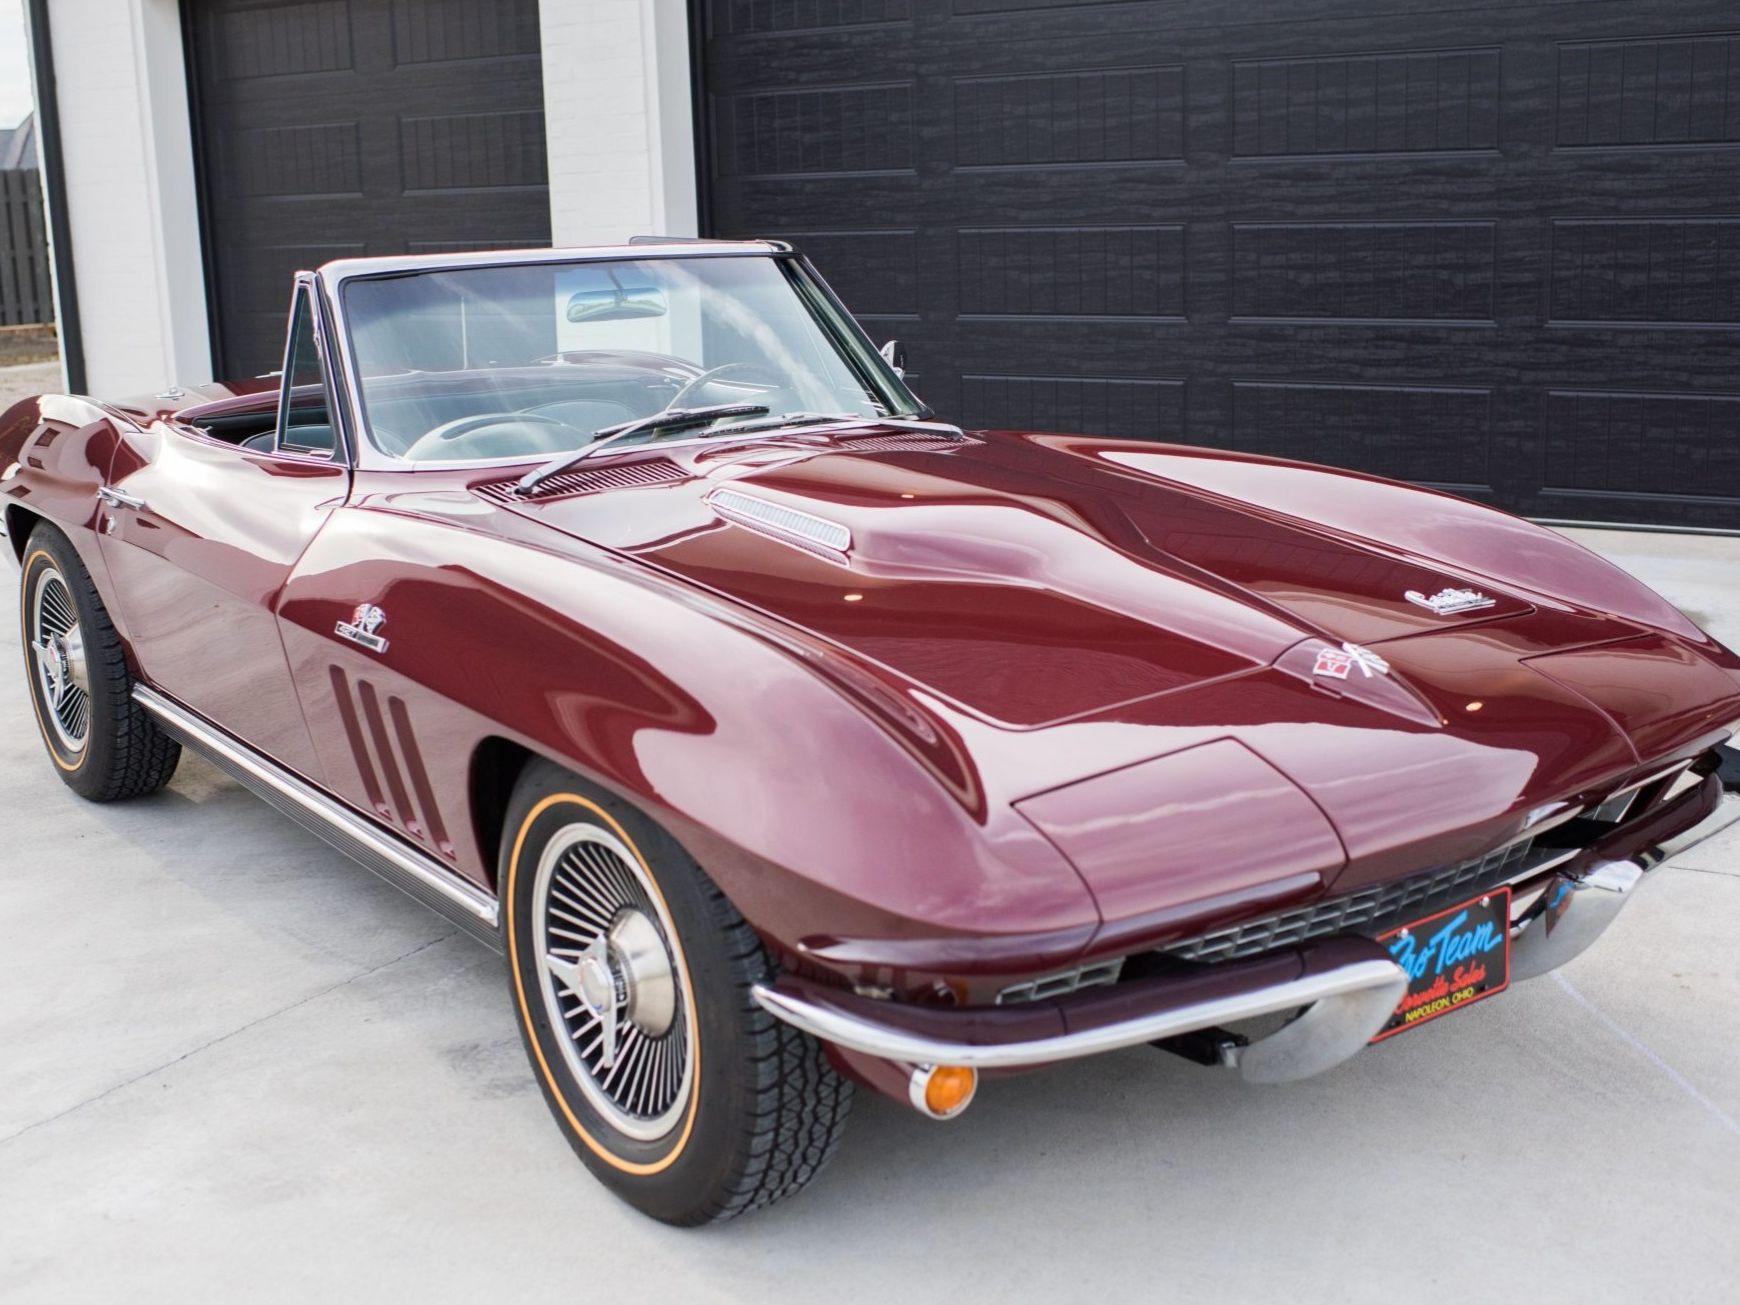 1966 Chevrolet Corvette Convertible 427/390 4-Speed